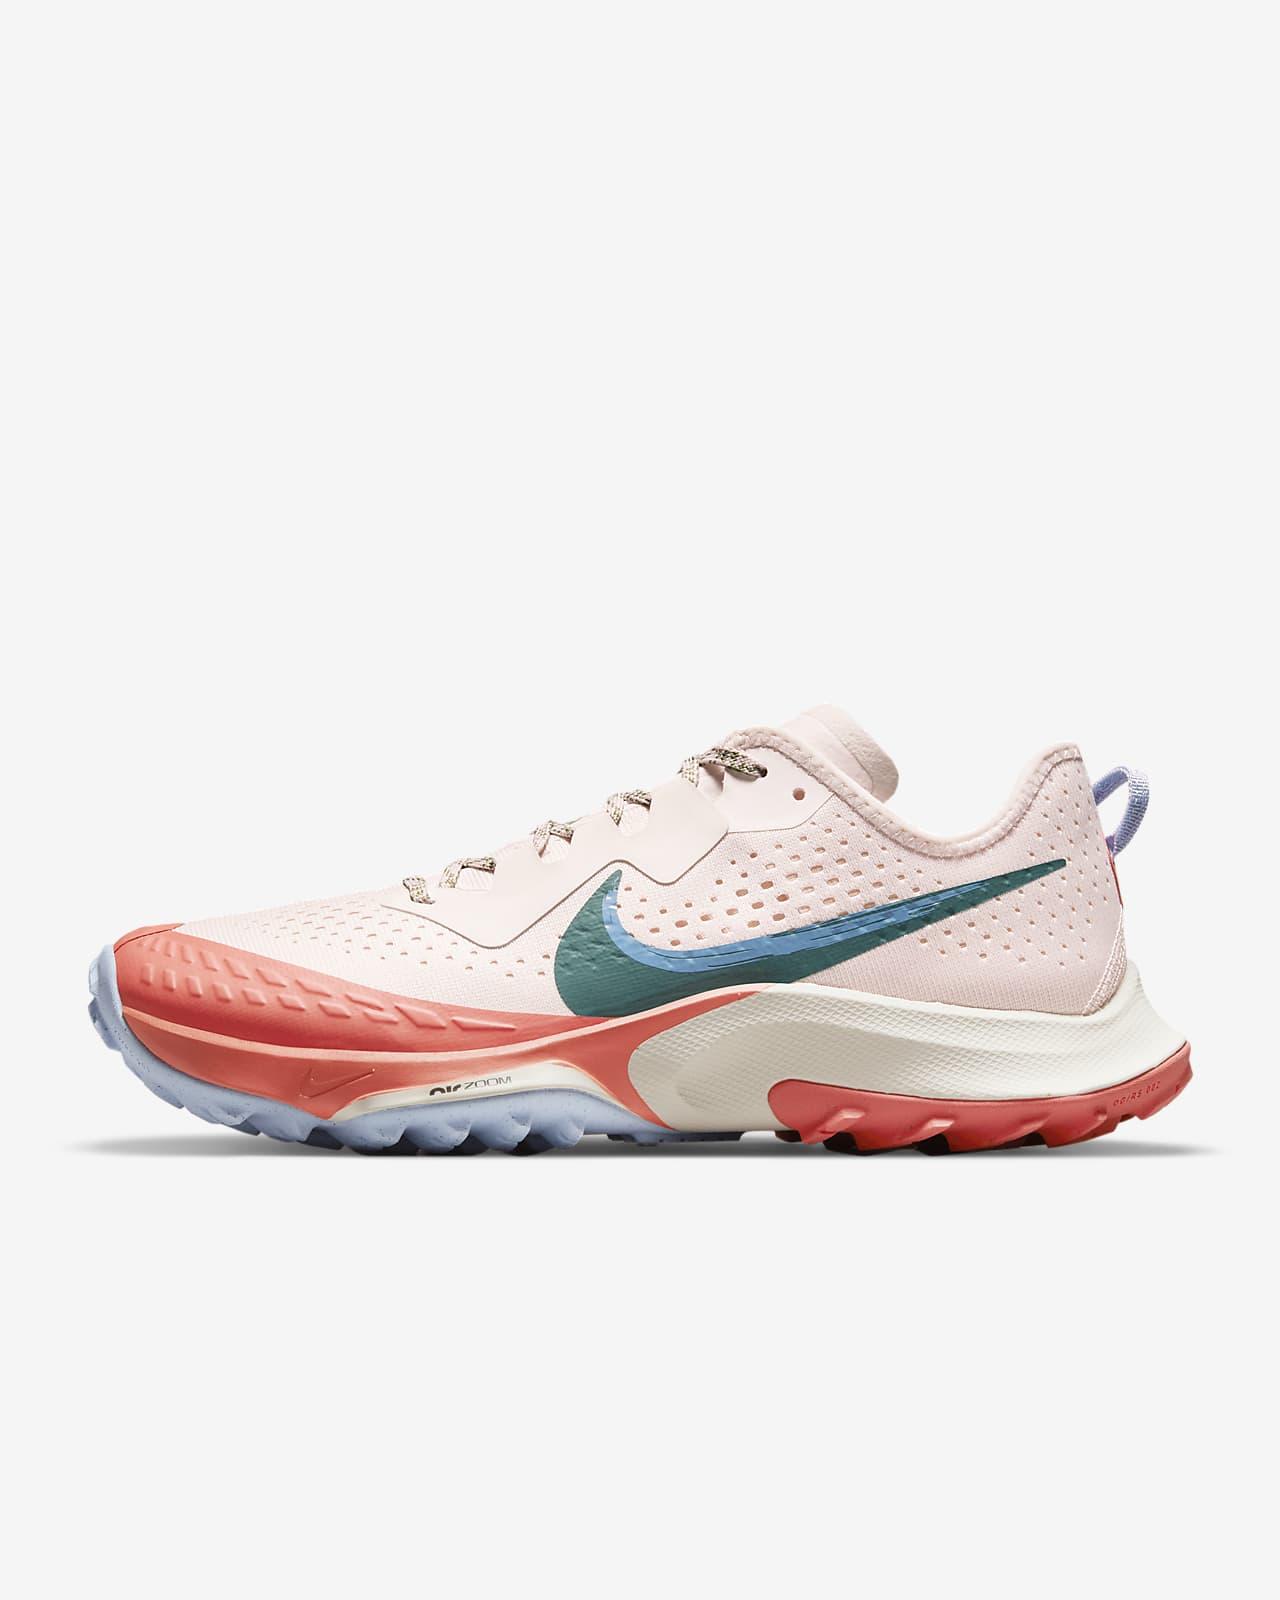 Nike Air Zoom Terra Kiger 7 Women's Trail Running Shoe